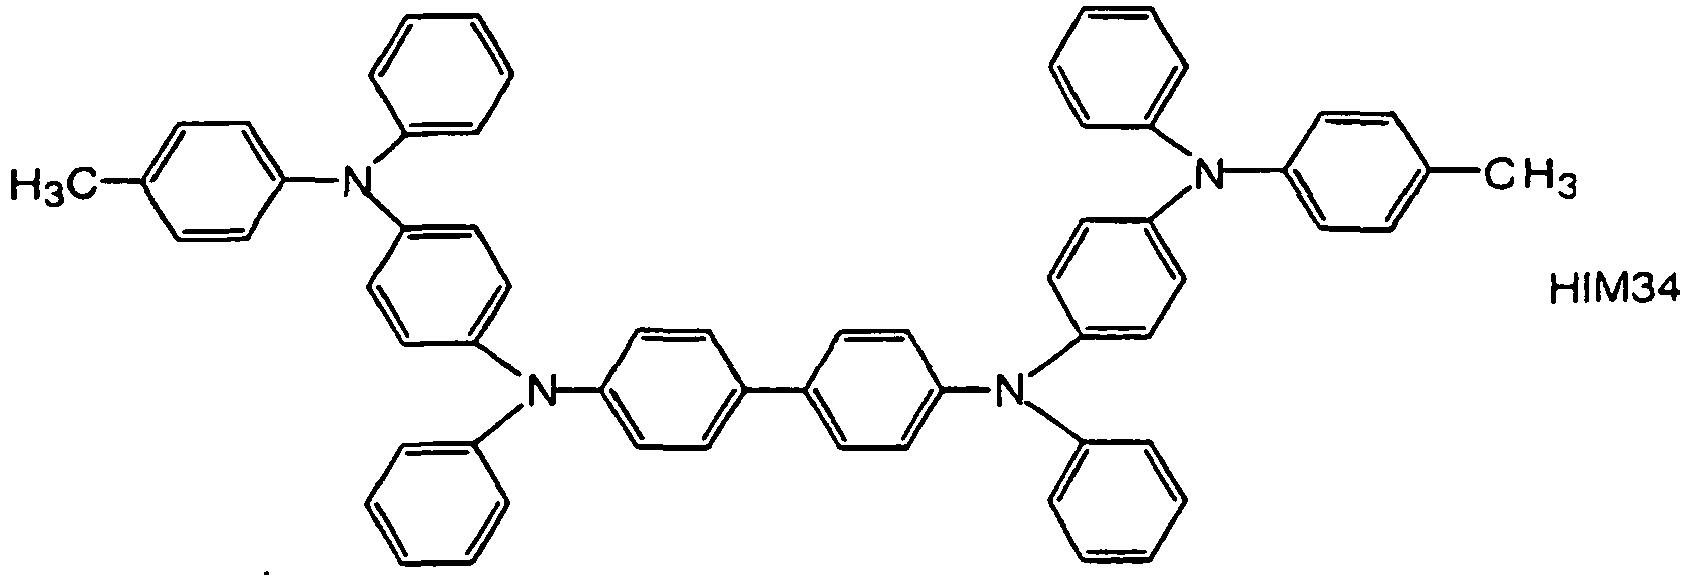 Figure imgb0942